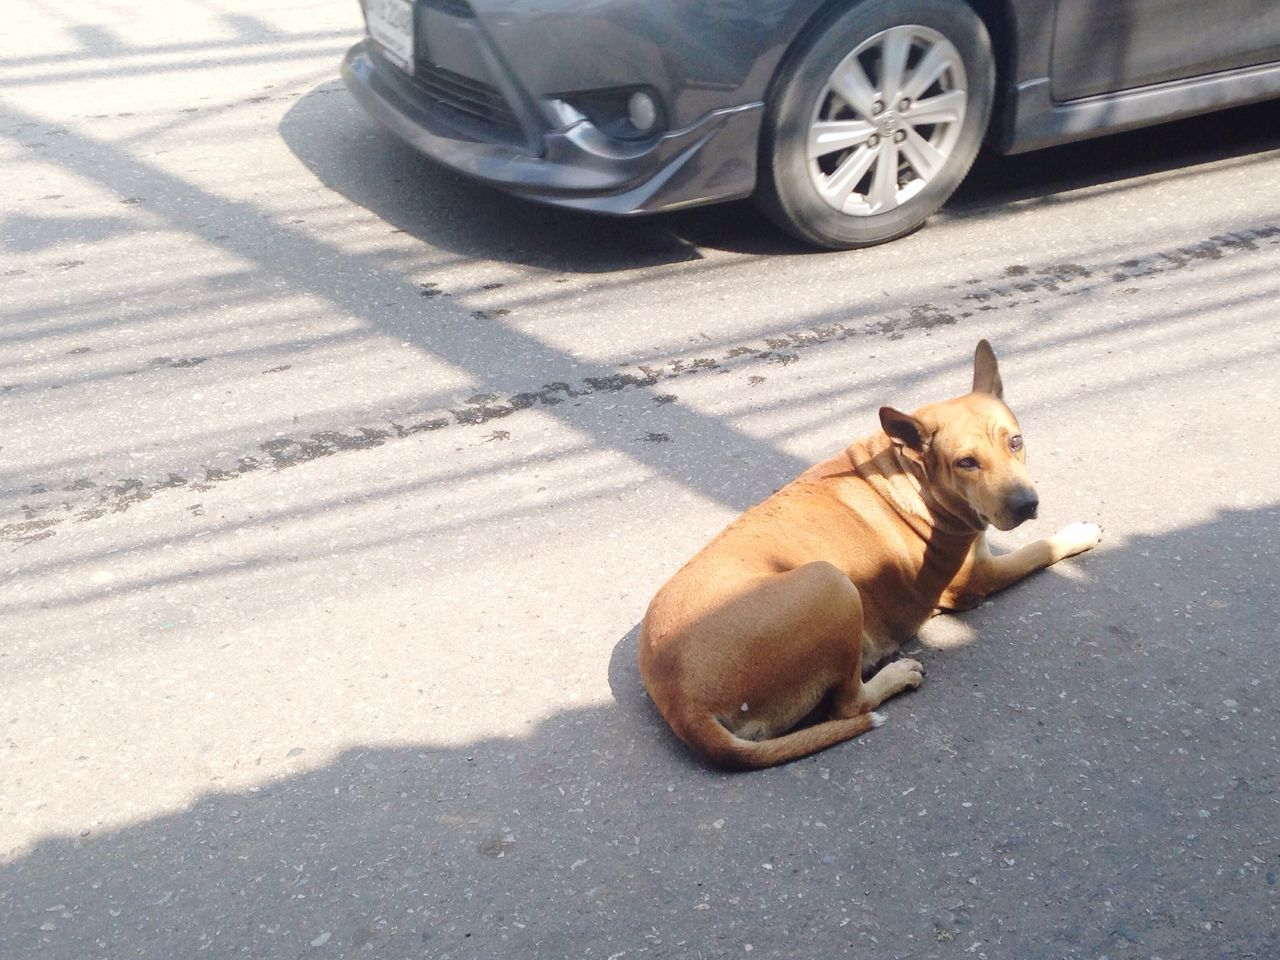 Brown Dog Thai Street Dog Chachoengsao Bangkla Temple Trip Road Trip Sunday Morning Driving Trip Thailand